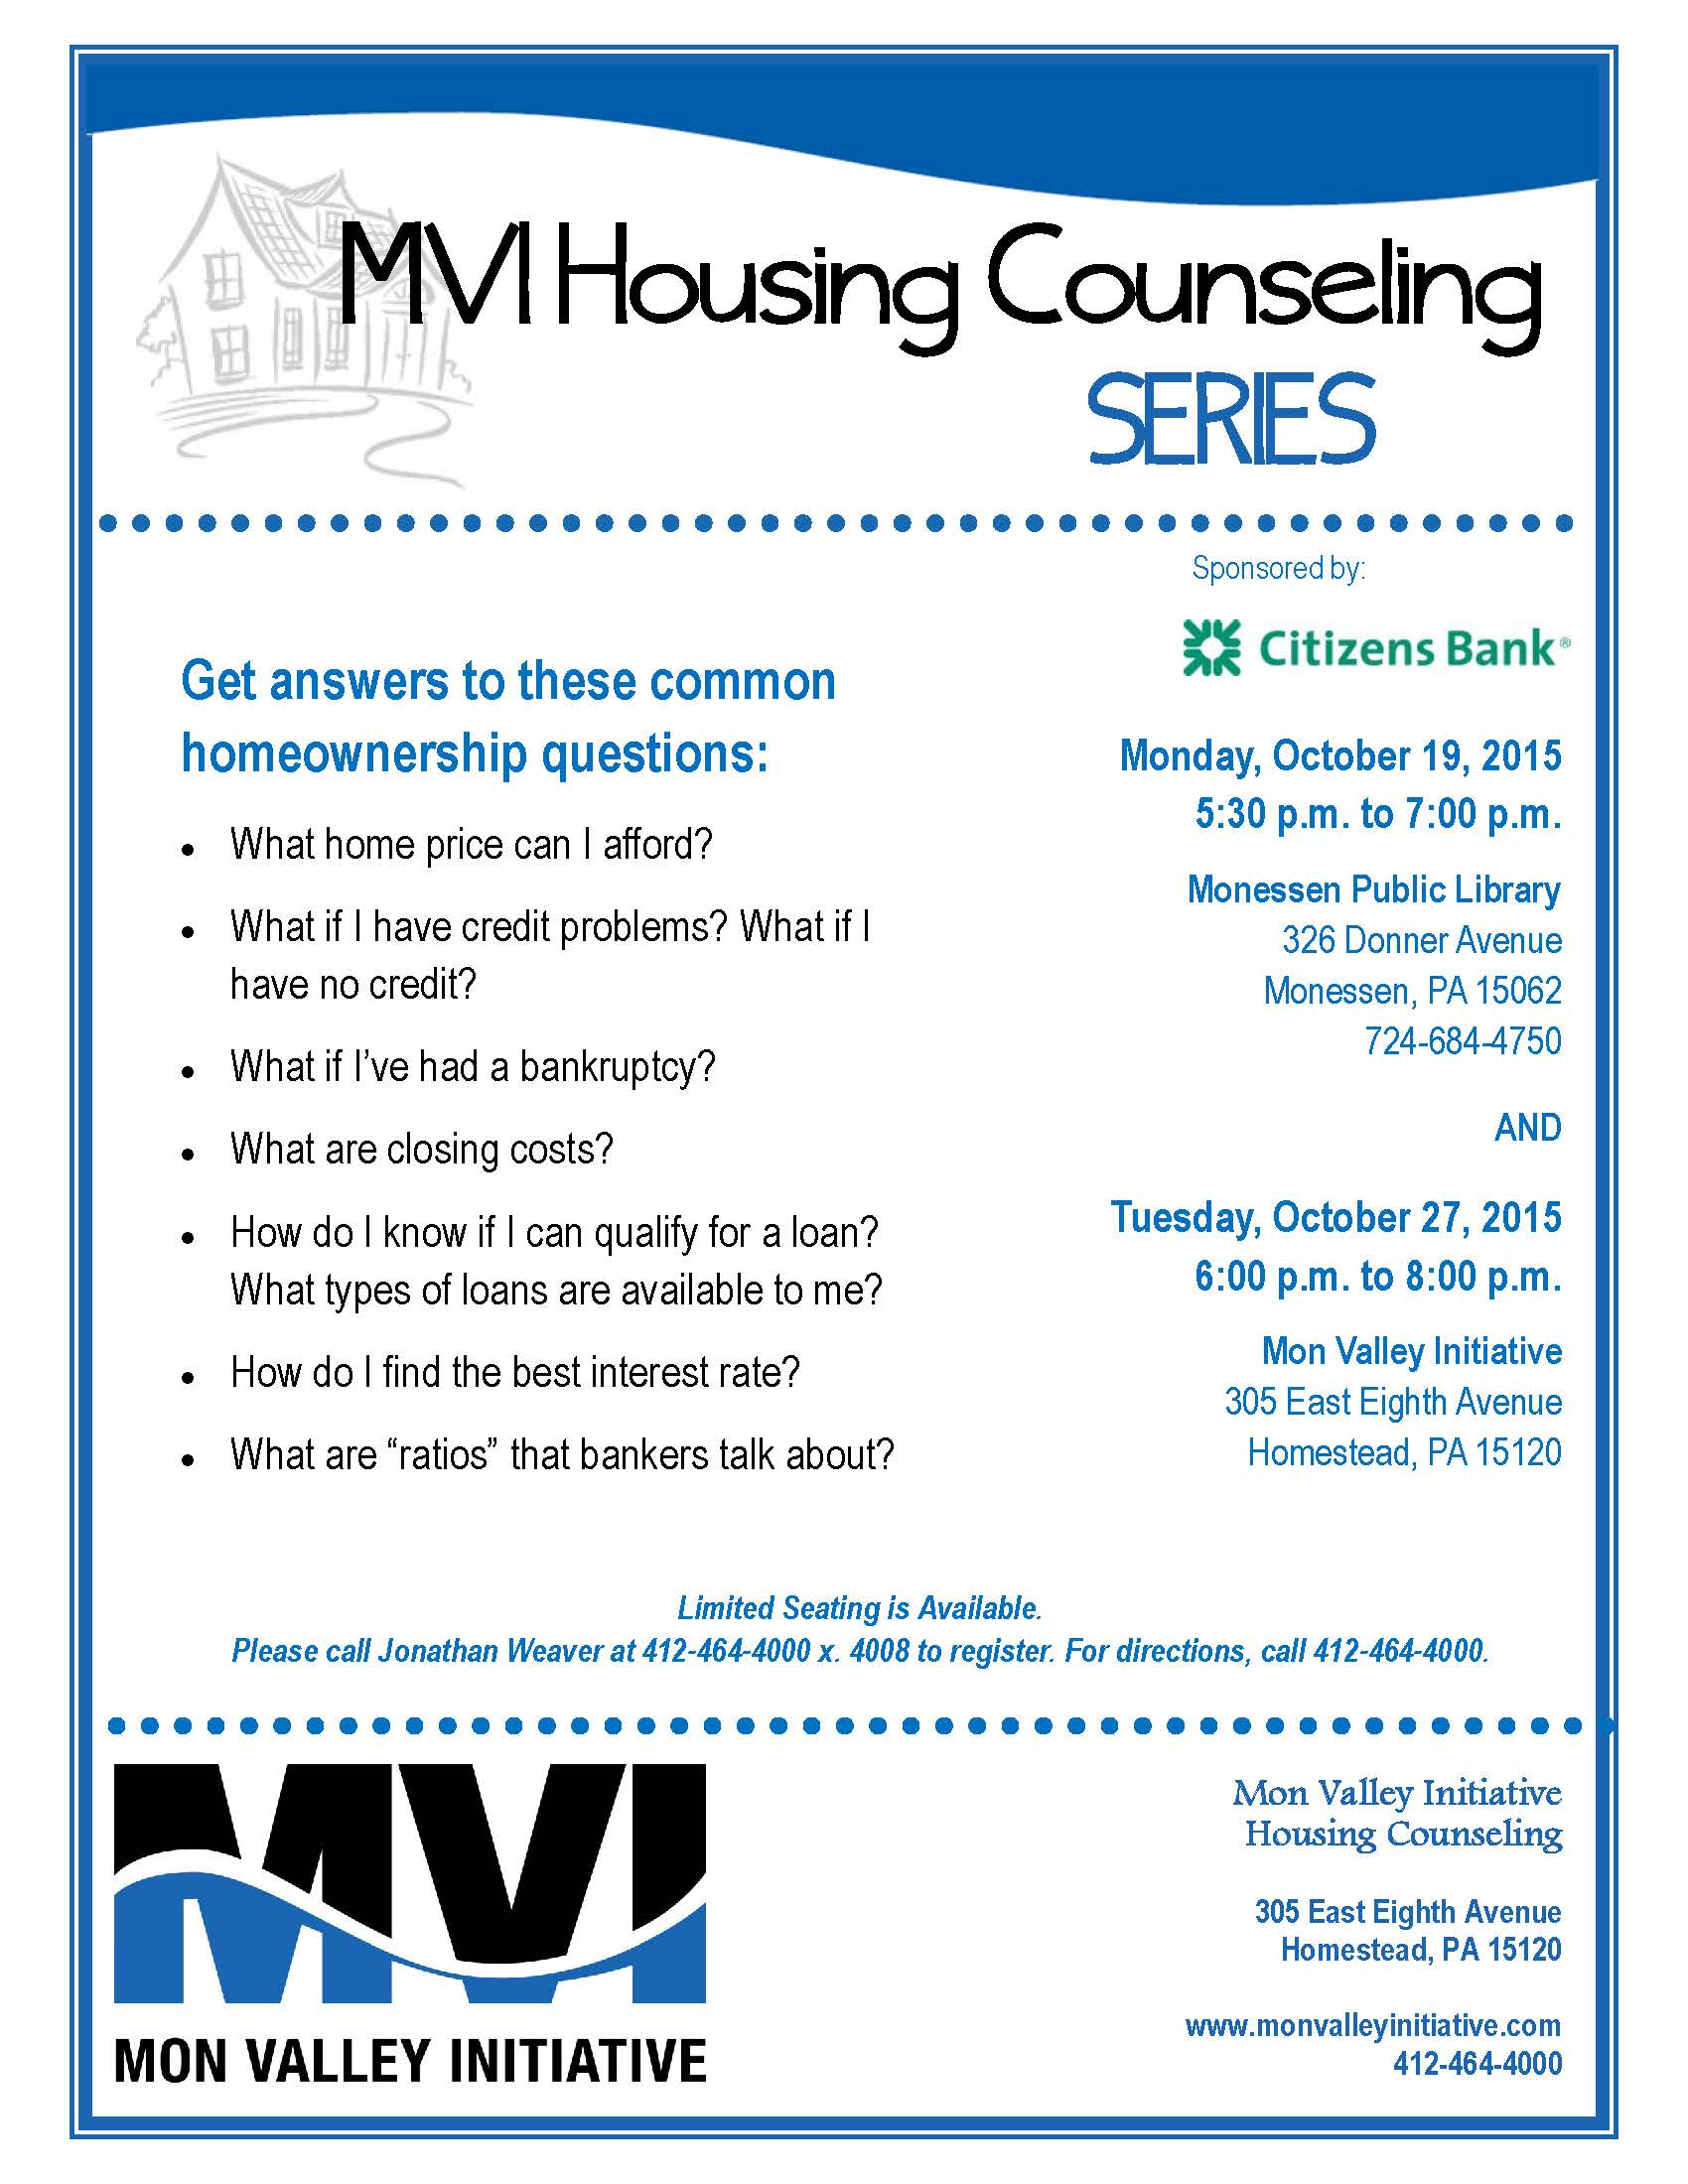 MVI Housing Counseling Series